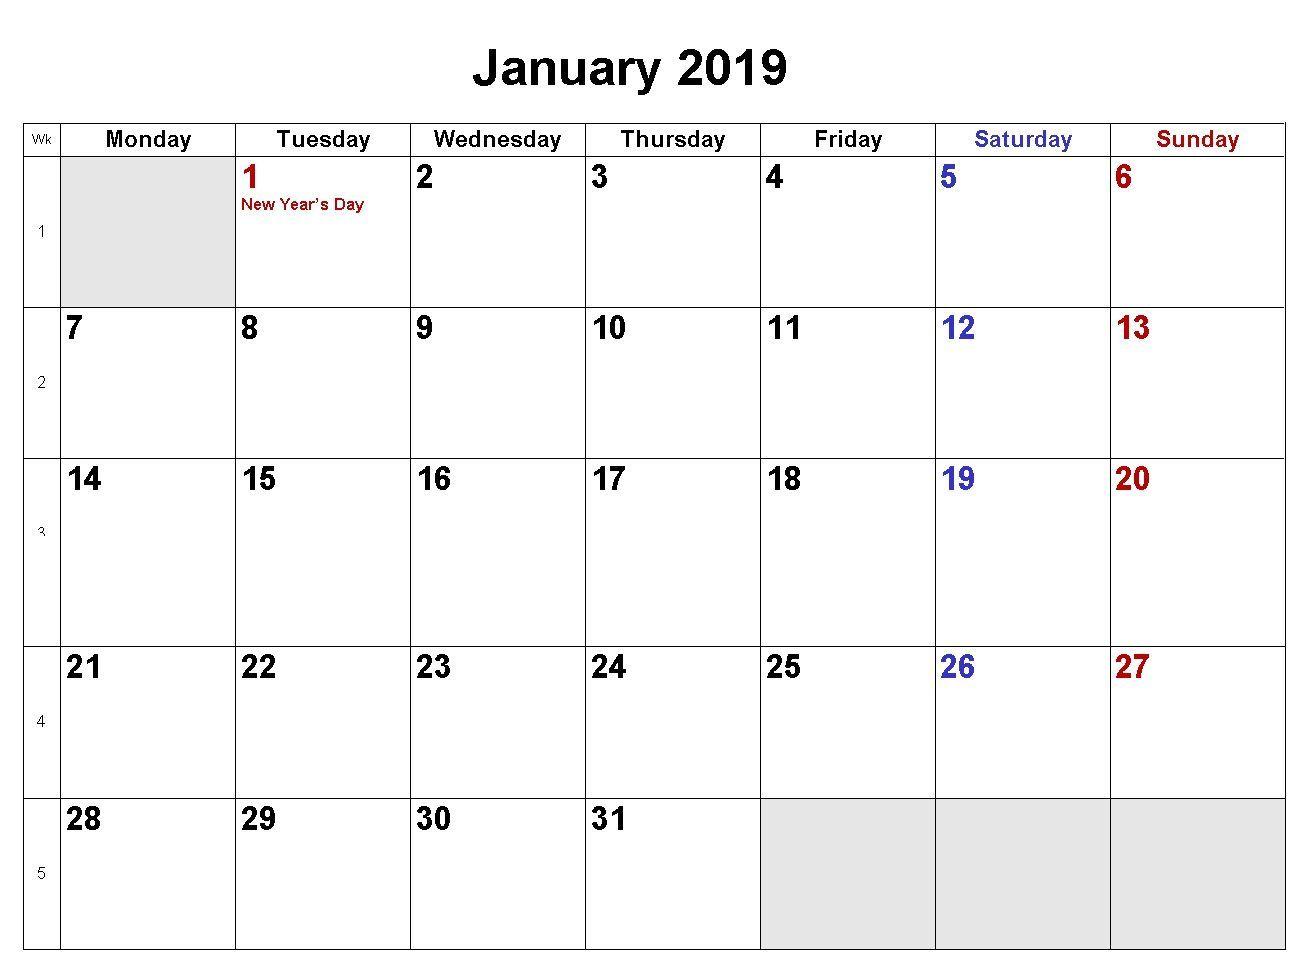 002 Free Printable Calendar Stupendous Word February 2019 March for Free Printable Calendar Templates Month